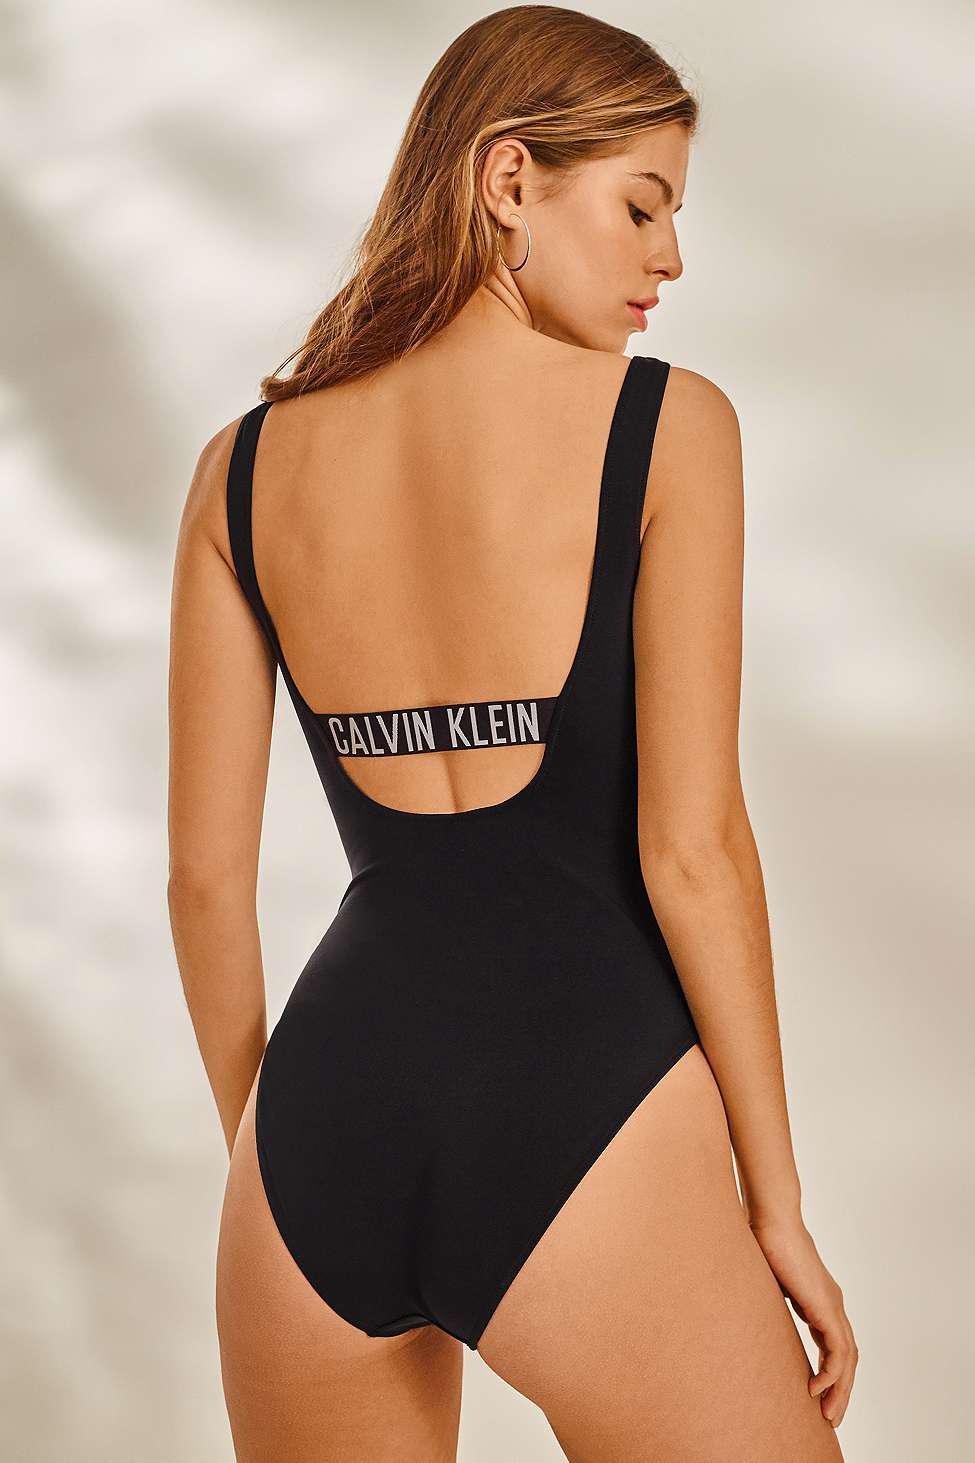 f5d0c4a6a8886 Calvin Klein Intense Power Black Square Scoop One-piece Swimsuit ...